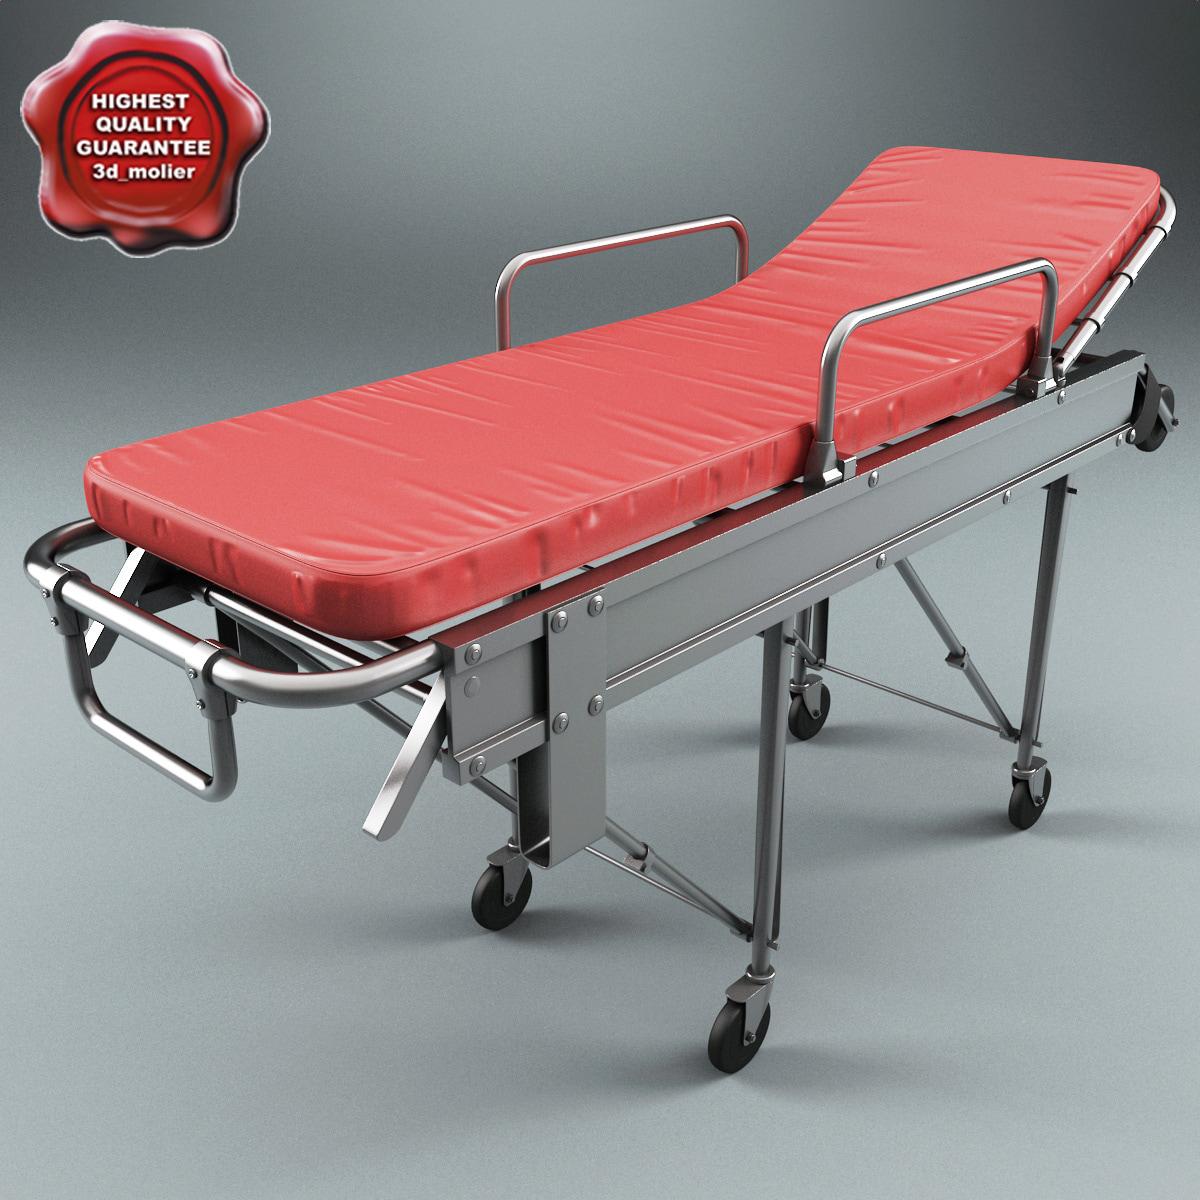 Ambulance_Stretcher_YXH_3B_00.jpg